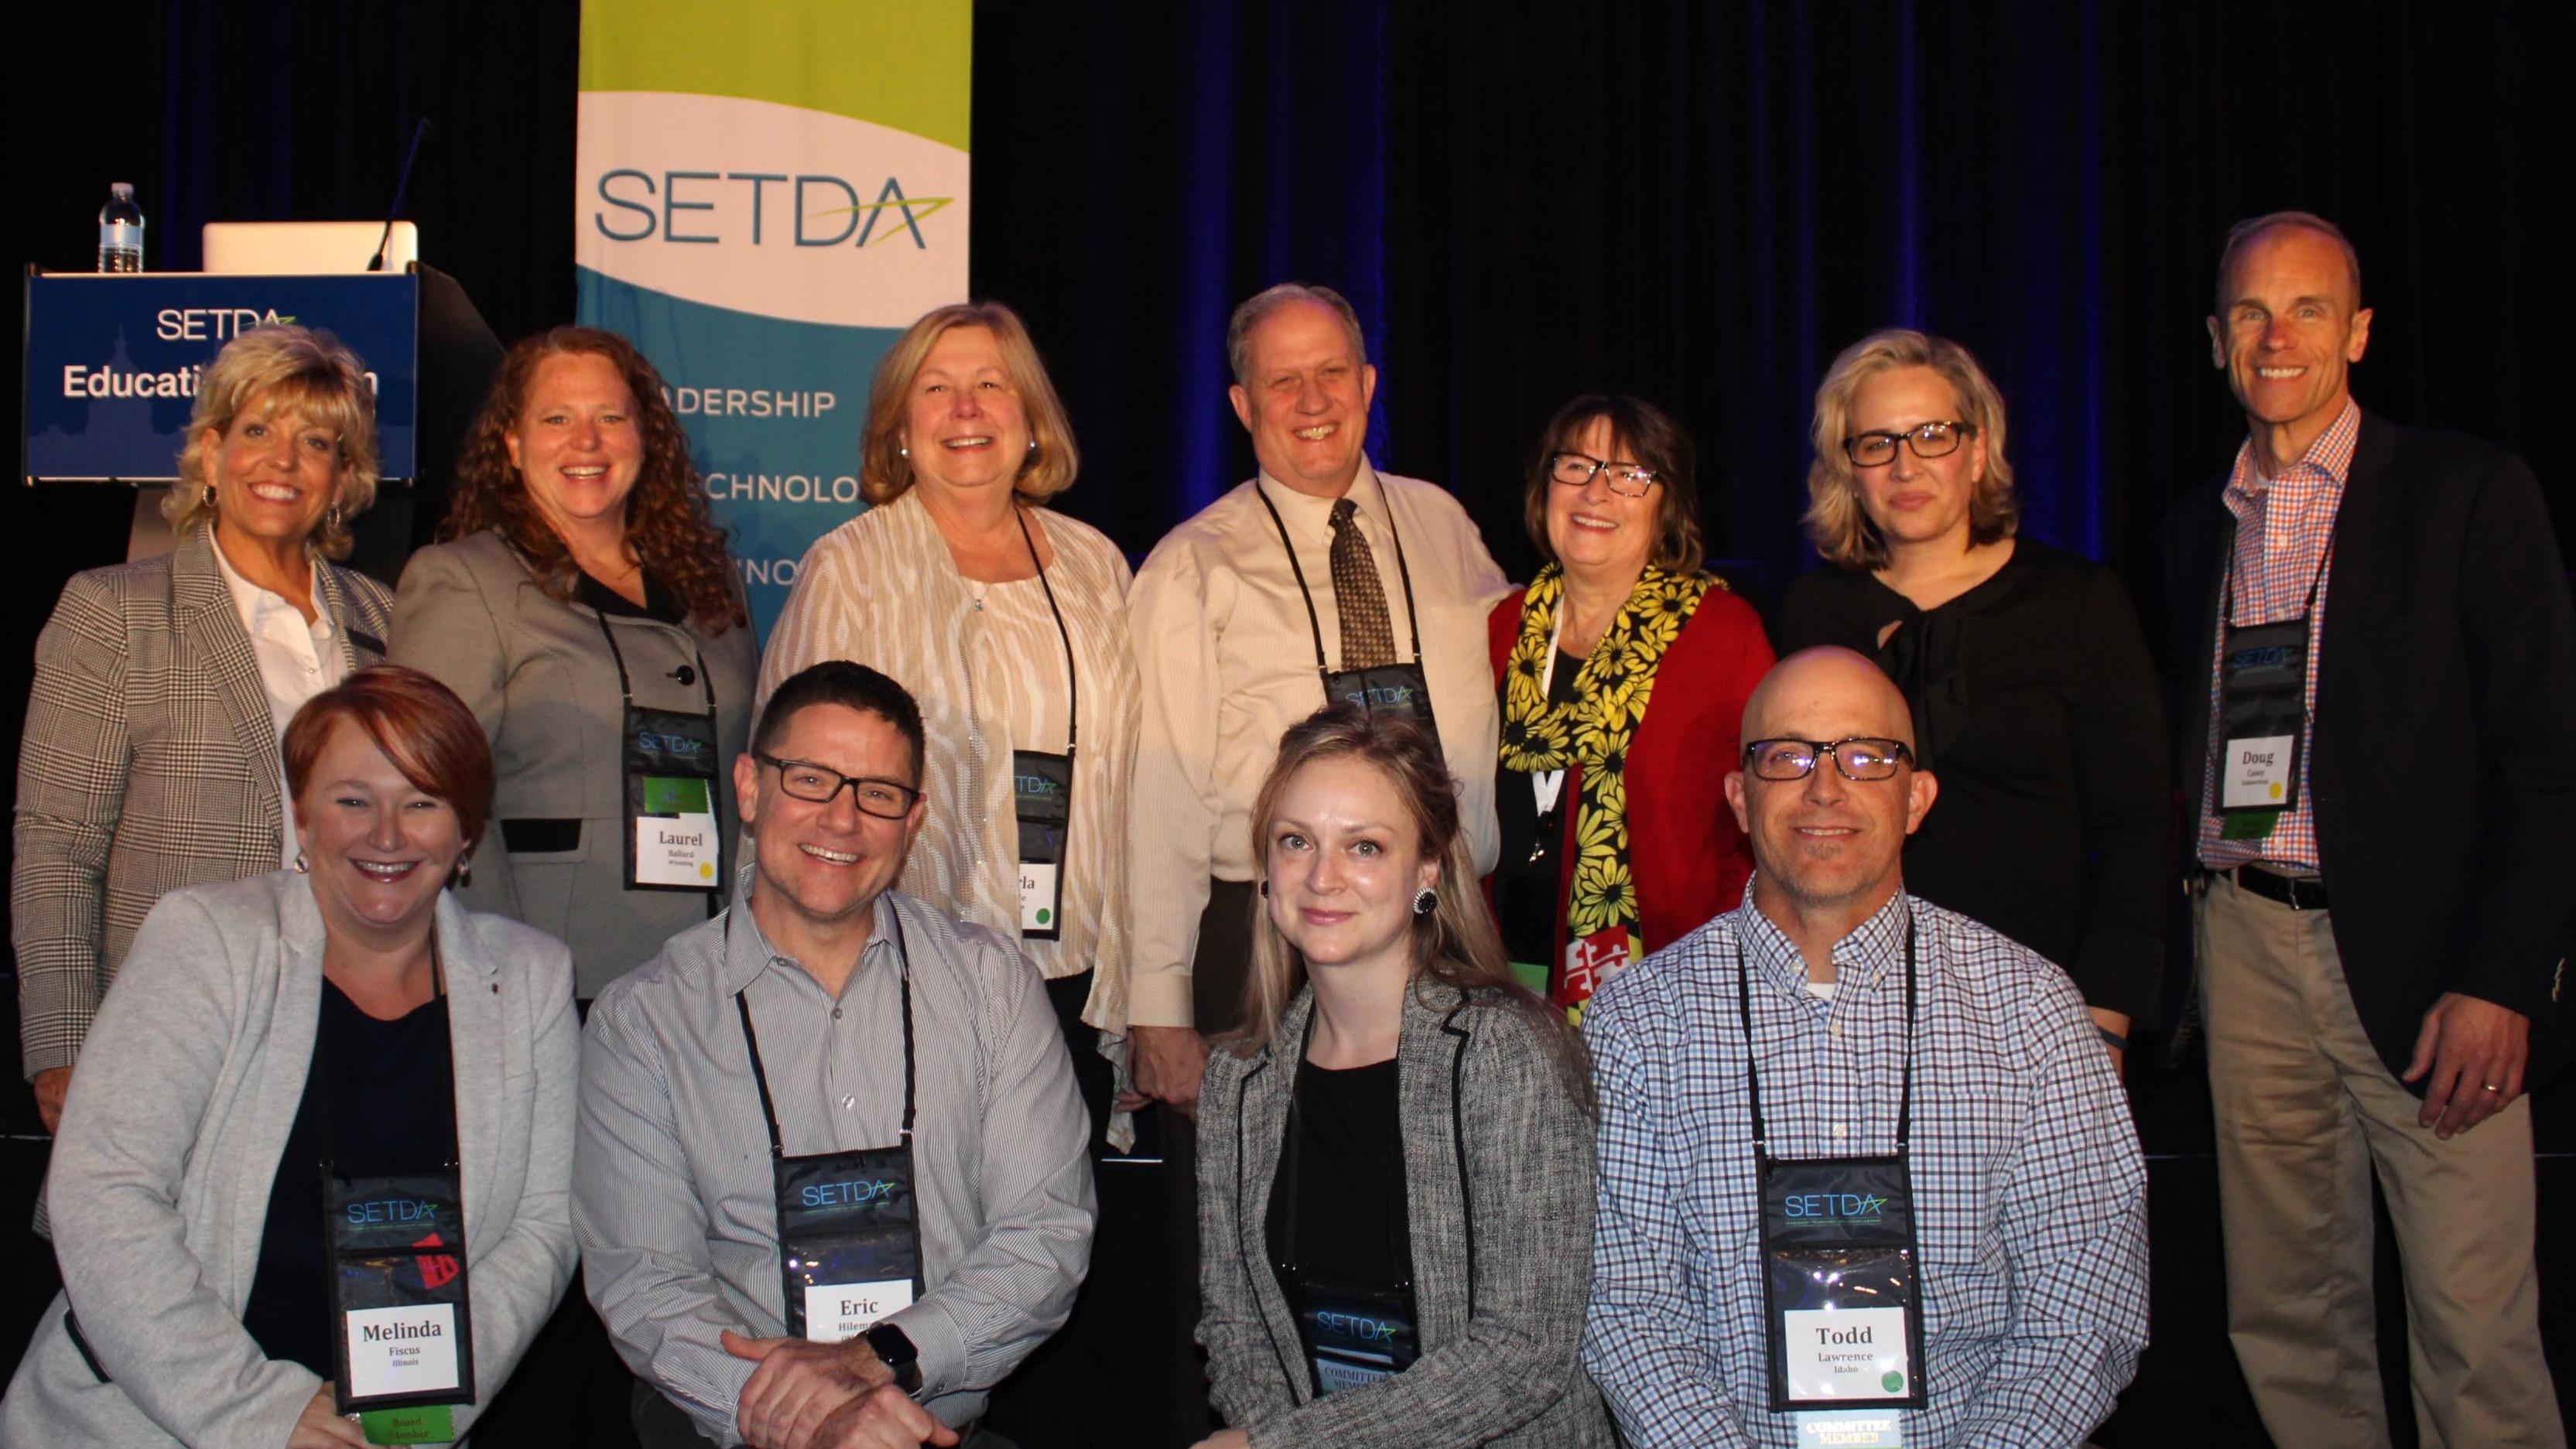 SETDA board members